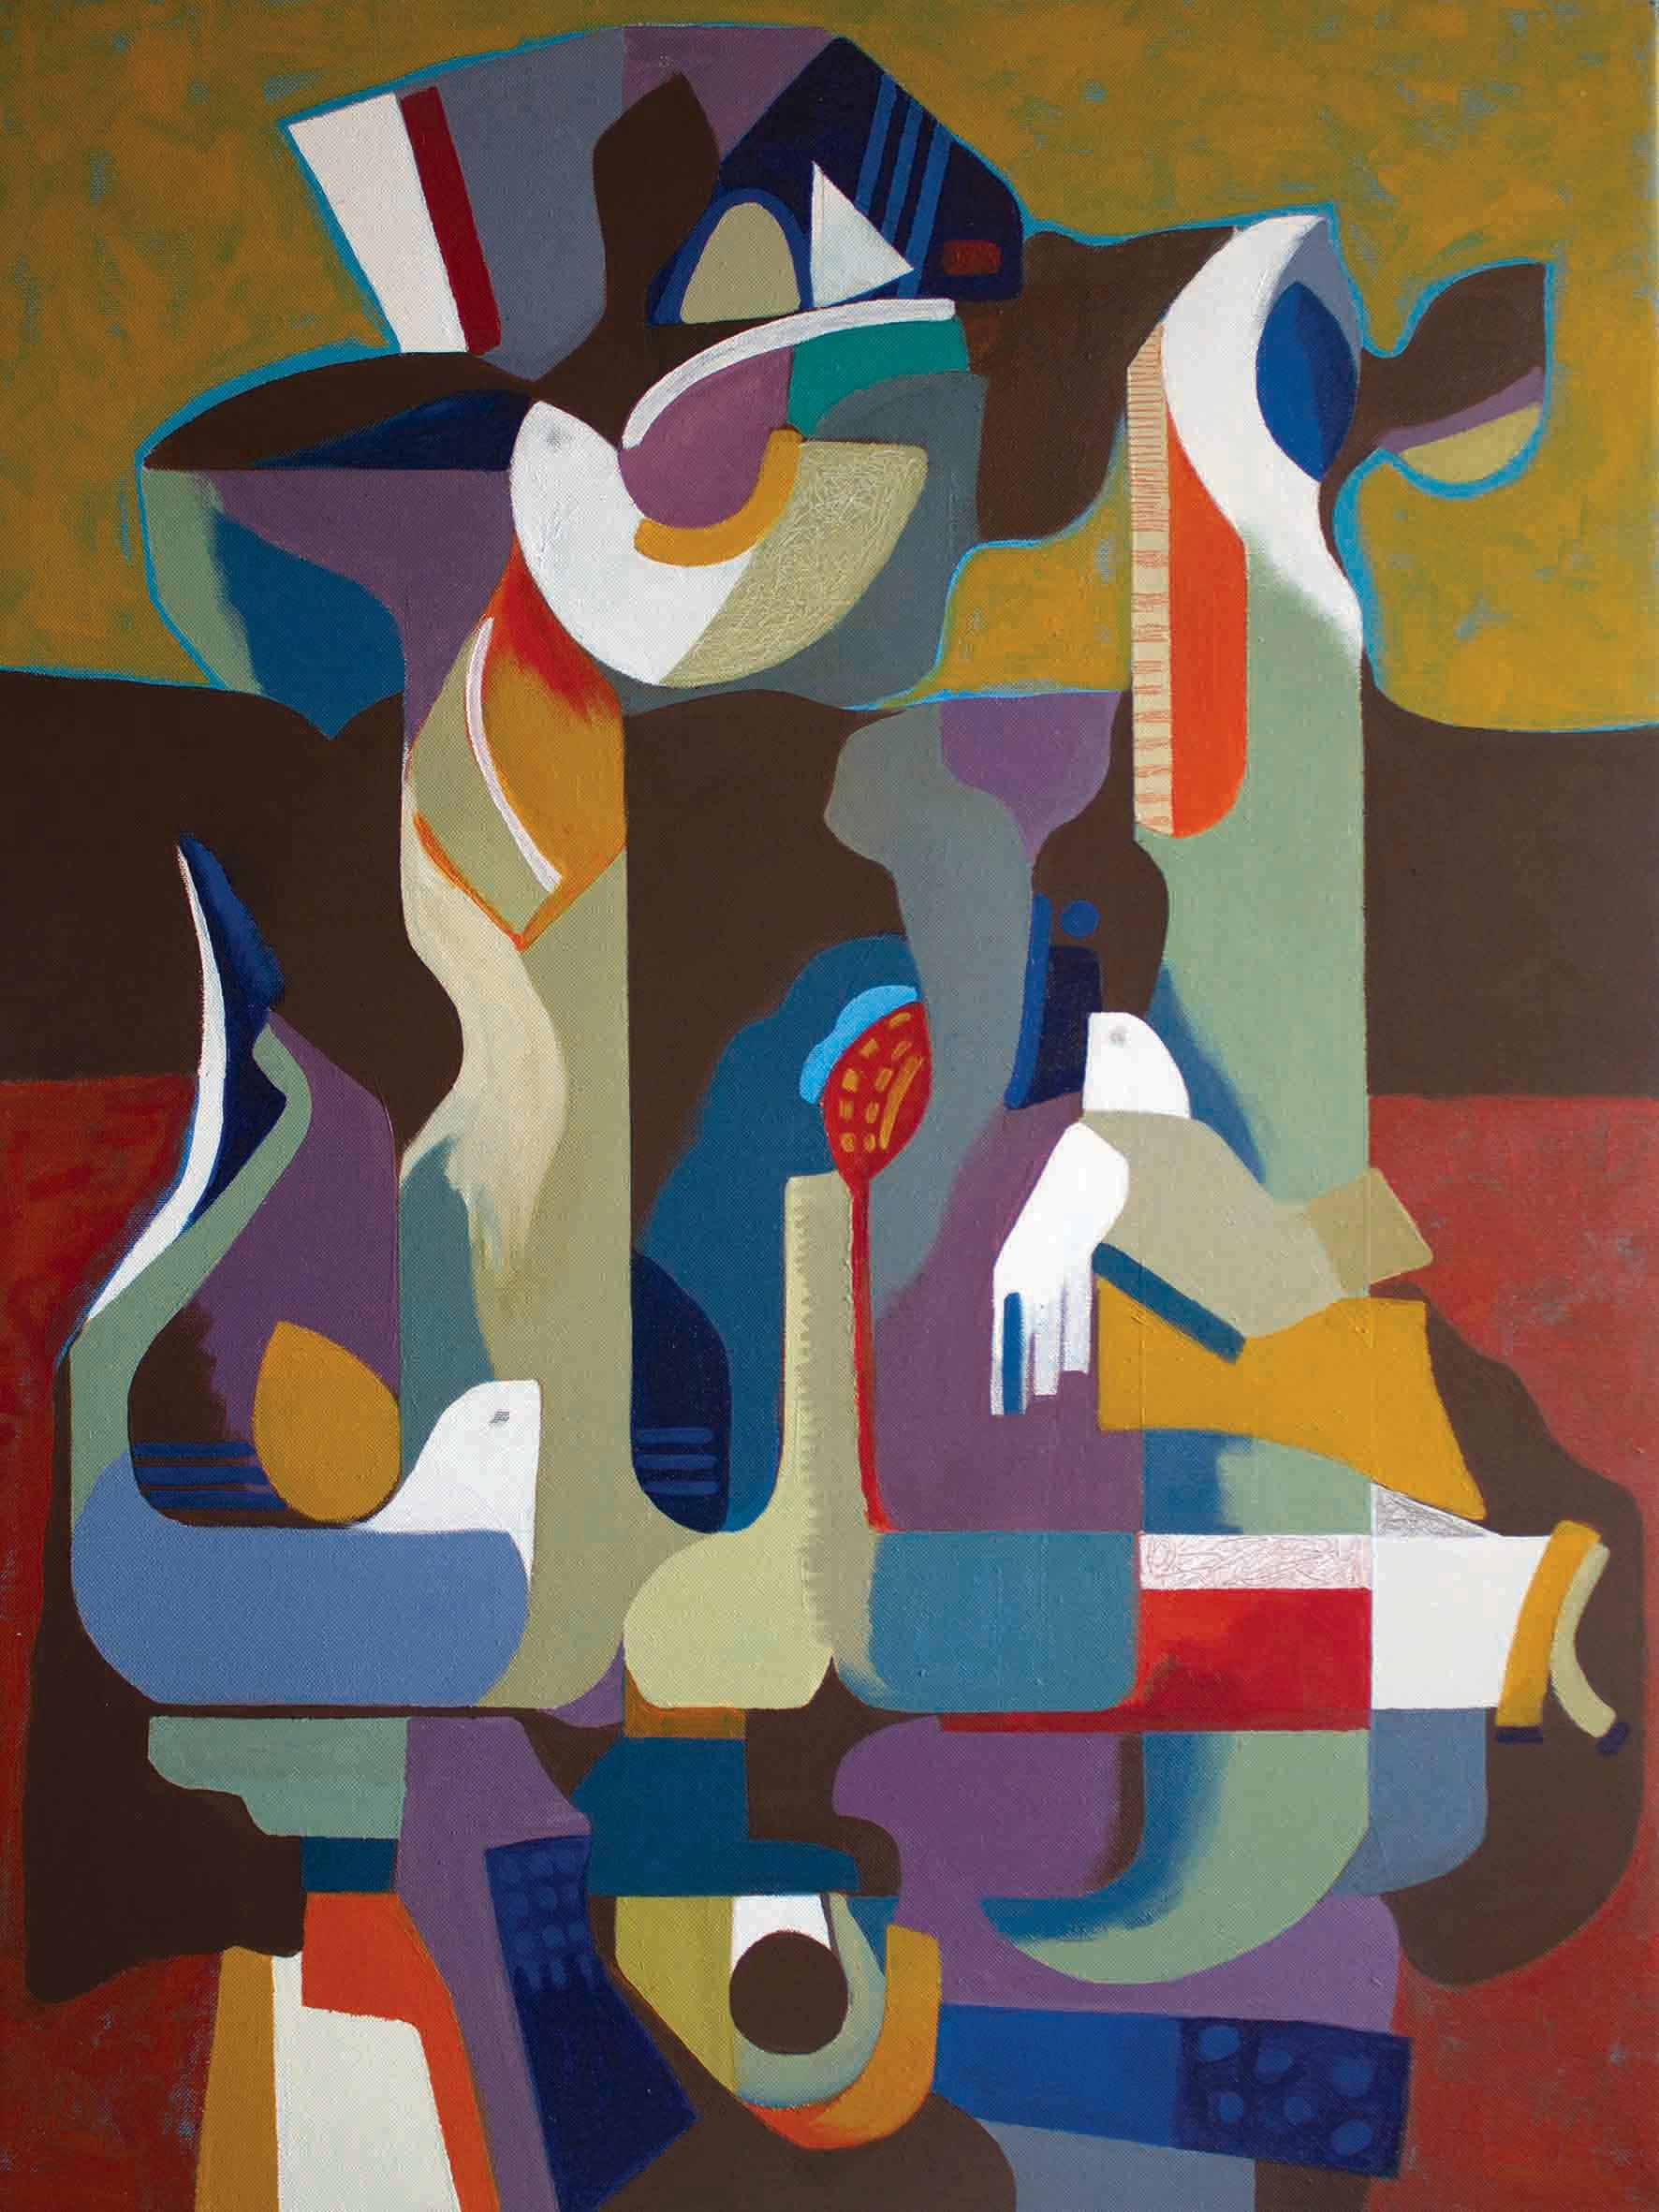 Johar 31 by Iranian/Armenian artist Janet Hagobian